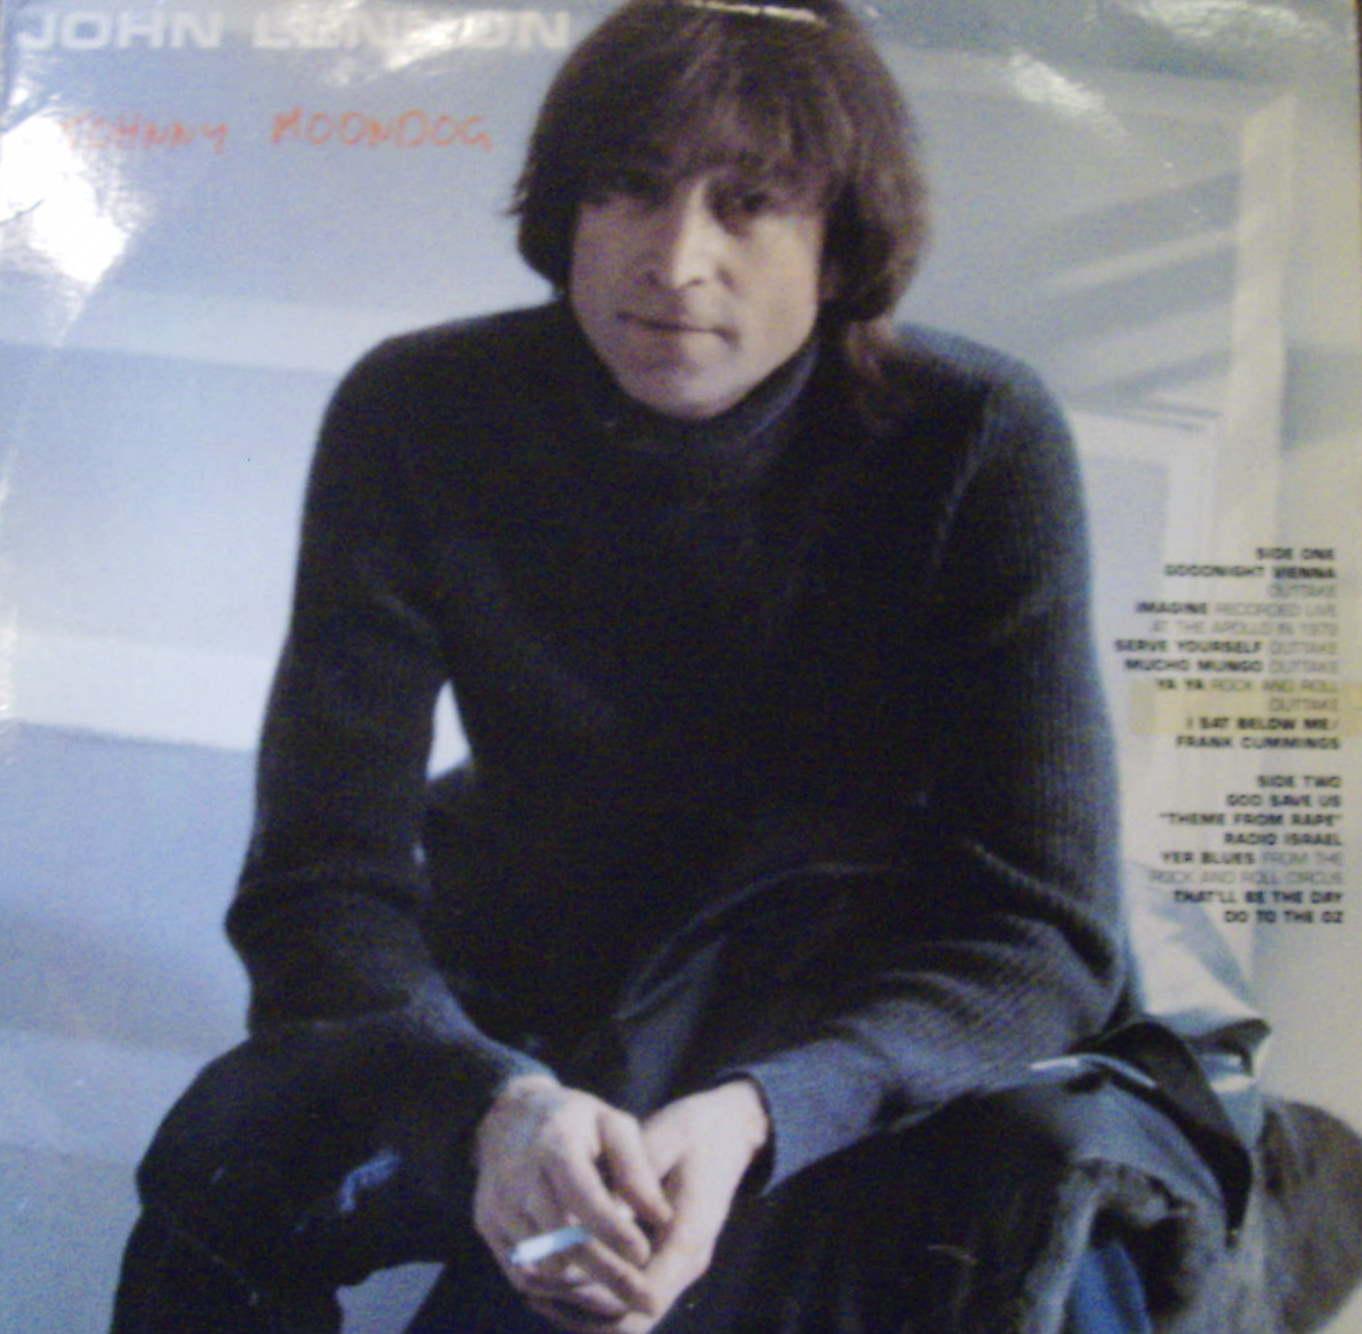 John Lennon - Johnny Moondog/telecasts